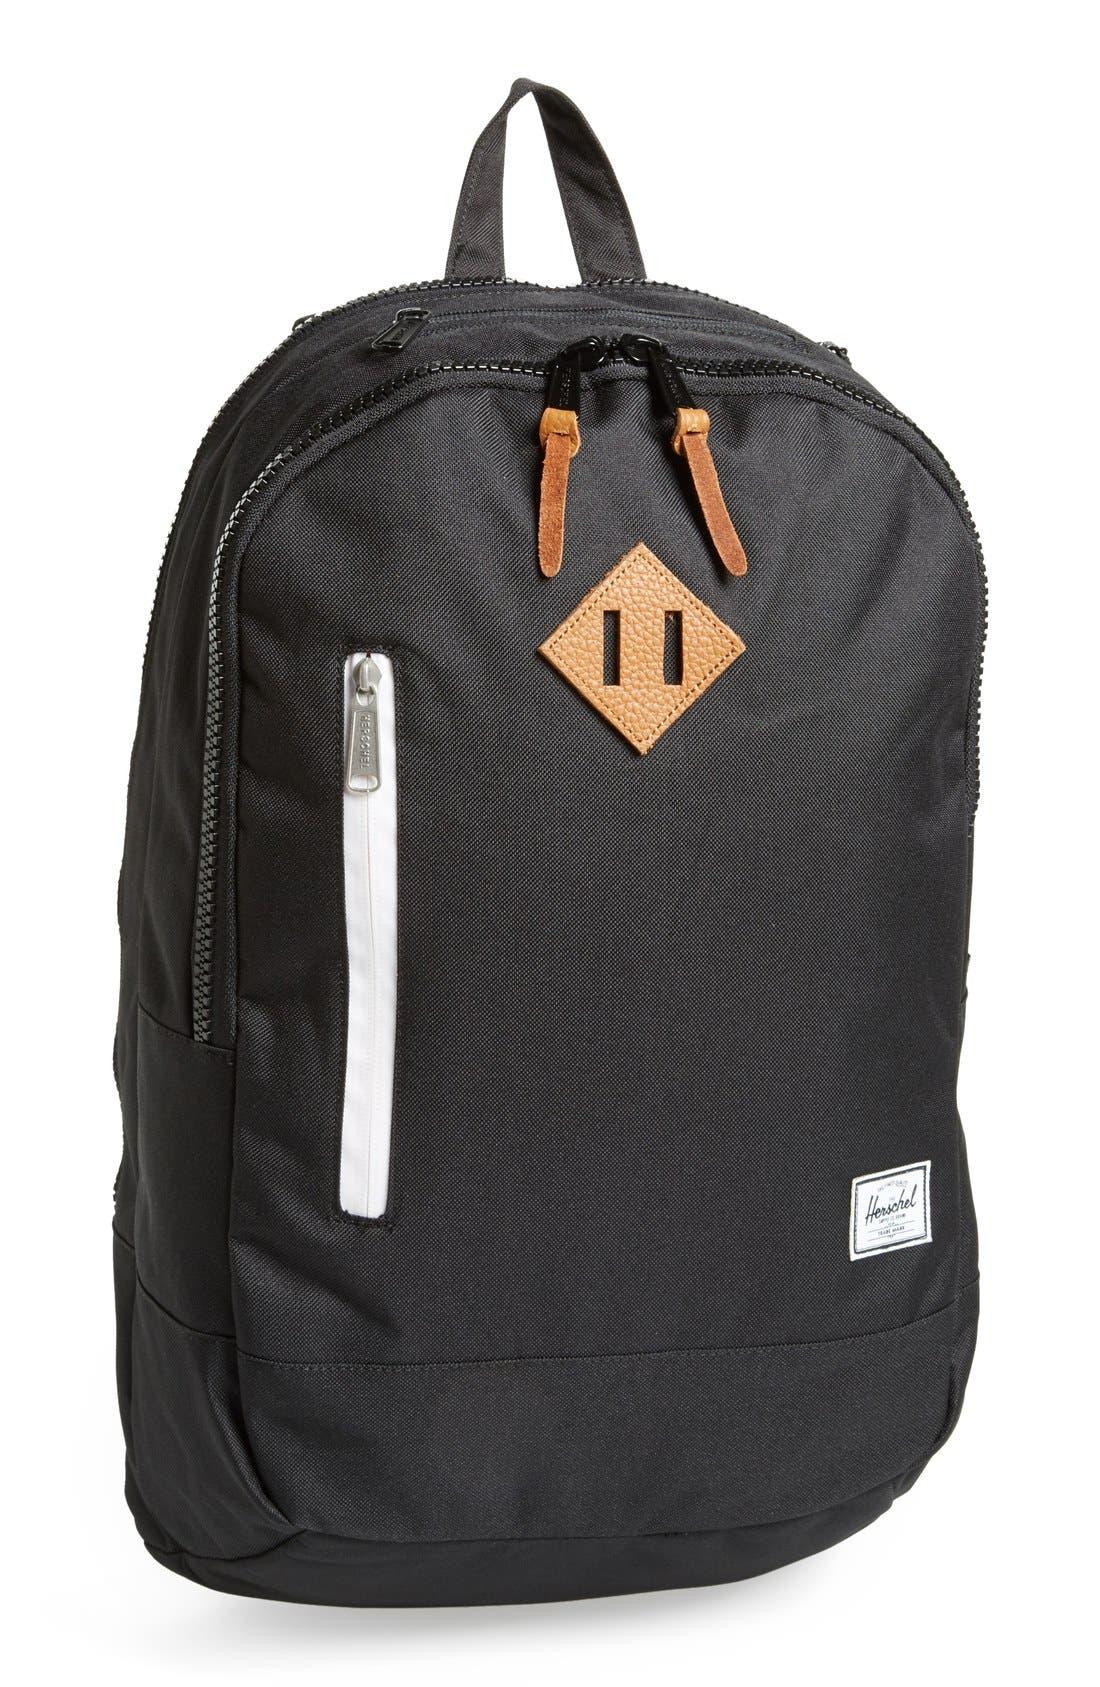 Main Image - Herschel Supply Co. 'Village' Backpack